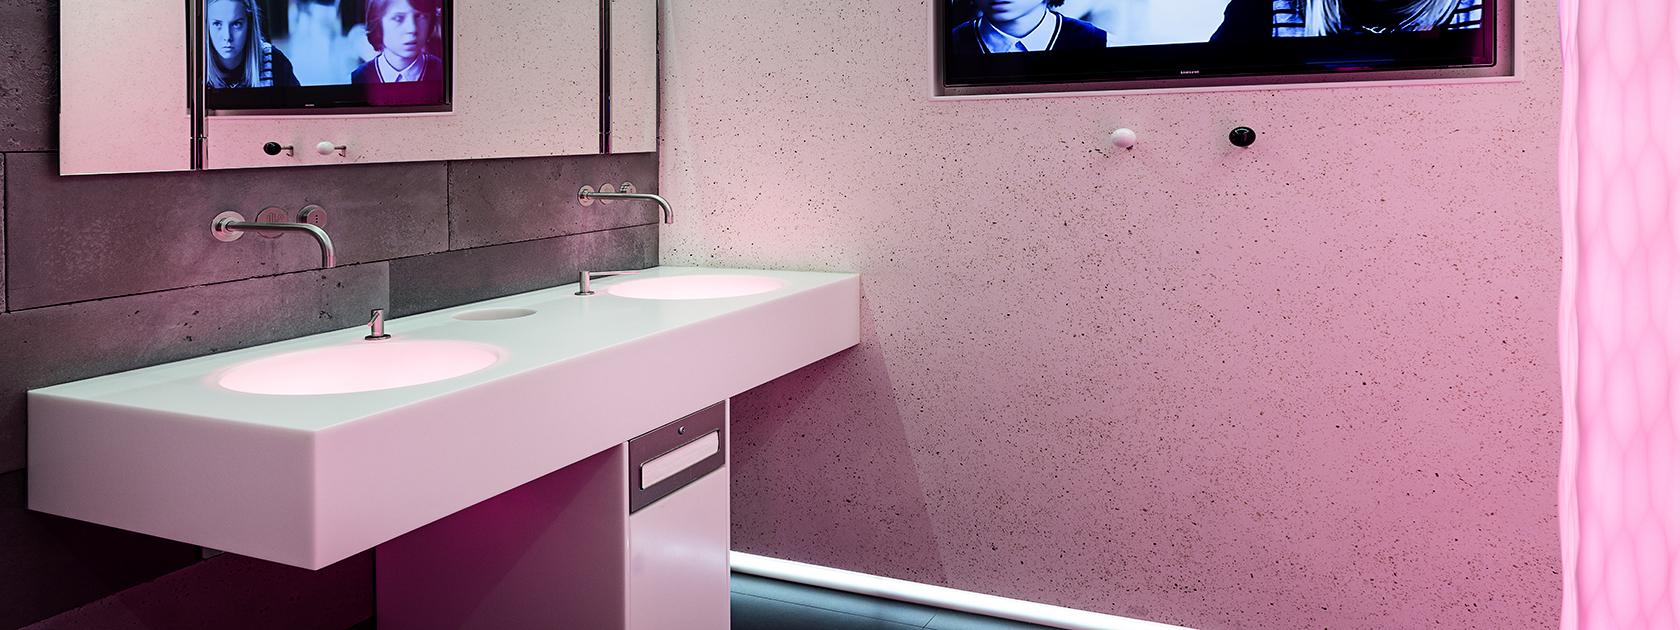 sport modehaus kaps pfeiffer gmbh co kg. Black Bedroom Furniture Sets. Home Design Ideas